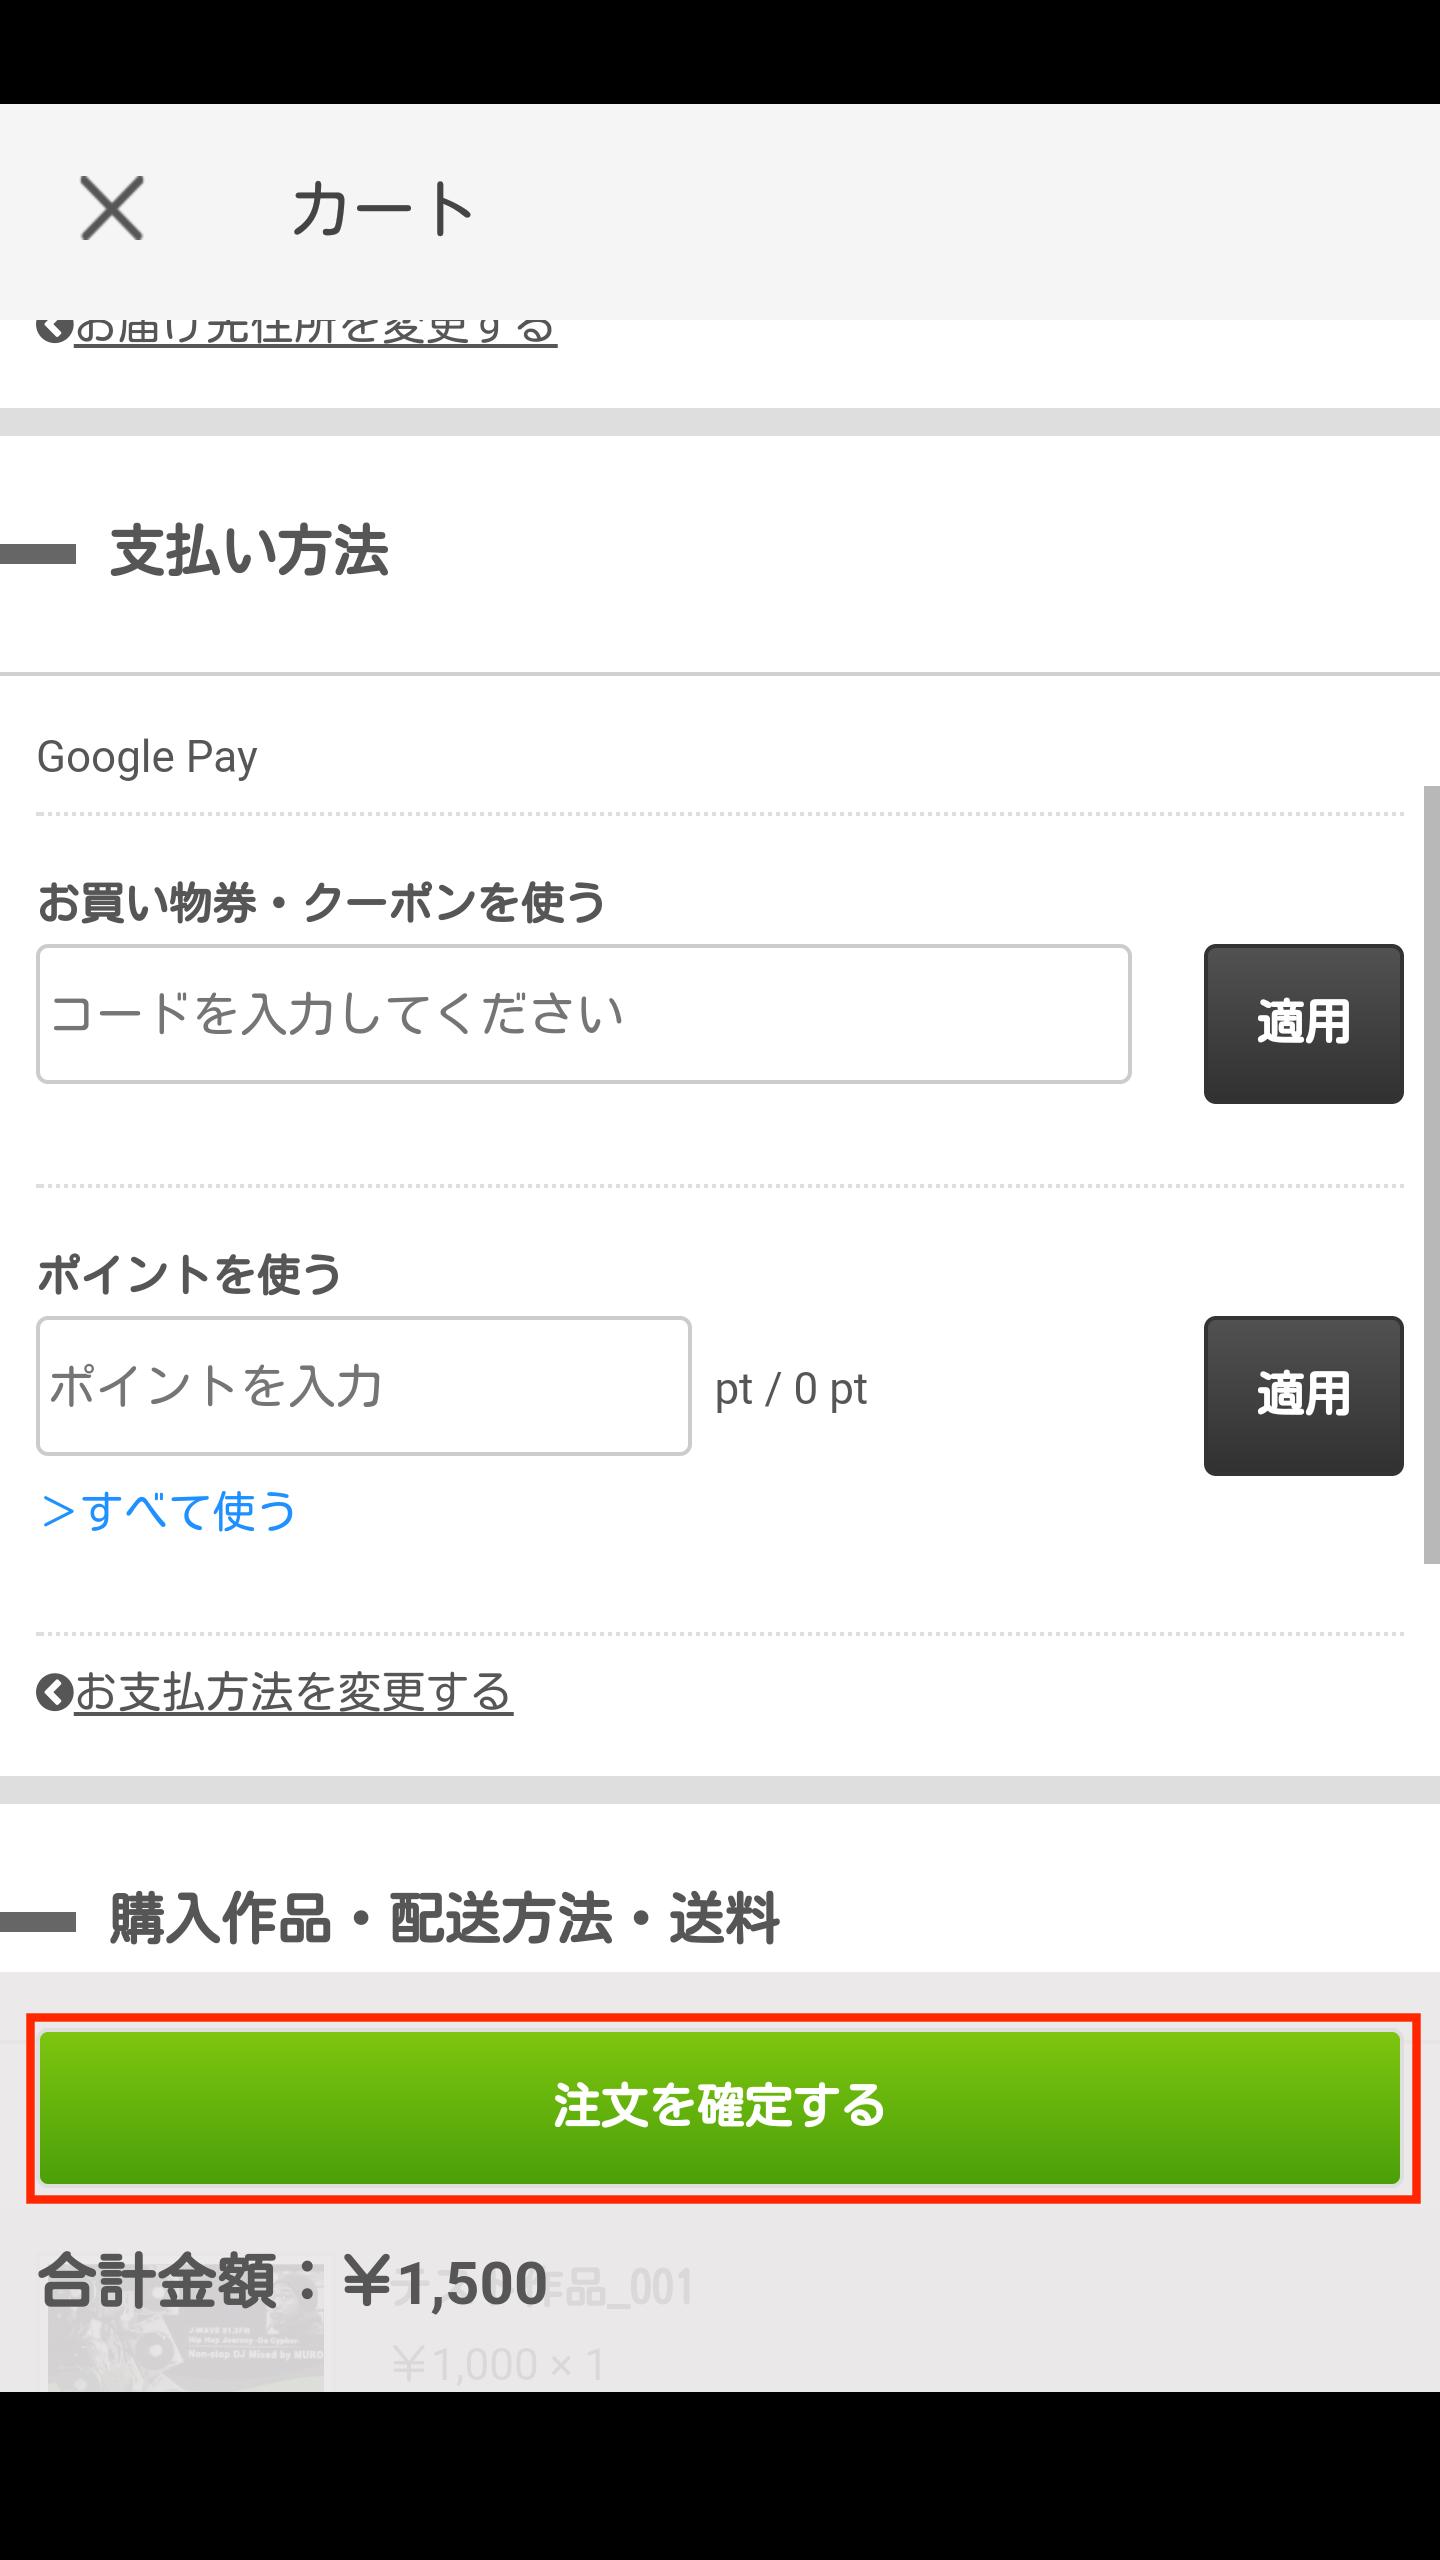 Google Pay 注文確定